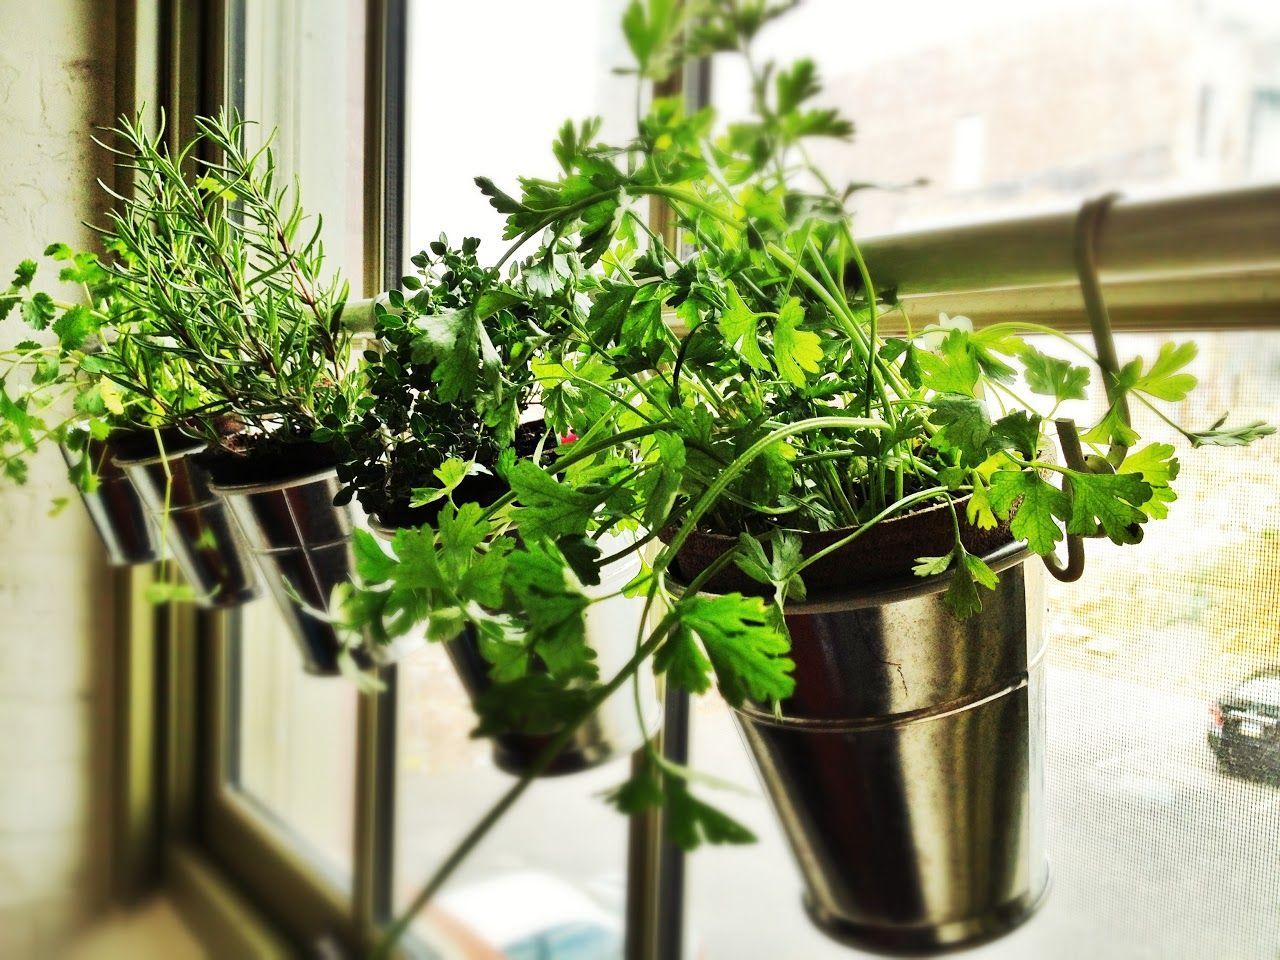 ikea hack window herb garden home pinterest bonnes id es jardins et cuisines. Black Bedroom Furniture Sets. Home Design Ideas